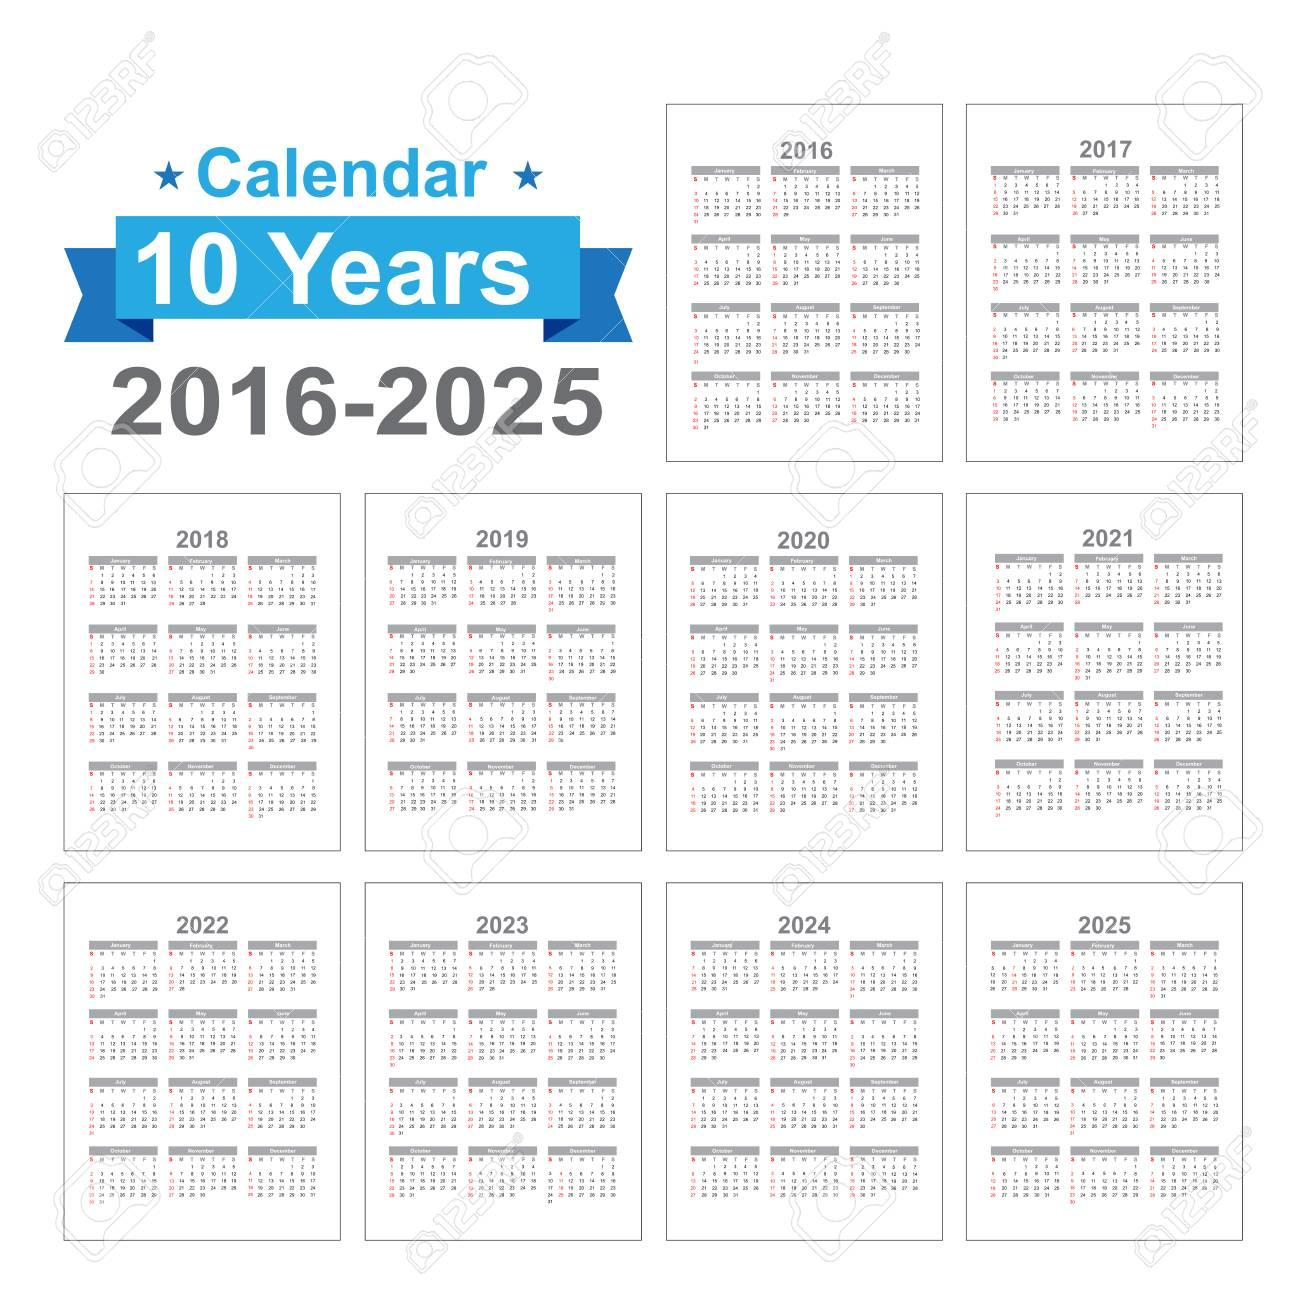 2020 2016 2020 Calendar 2016 2017 2018 2019 2020 2021 2022 2023 2024 2025 Calendar Black